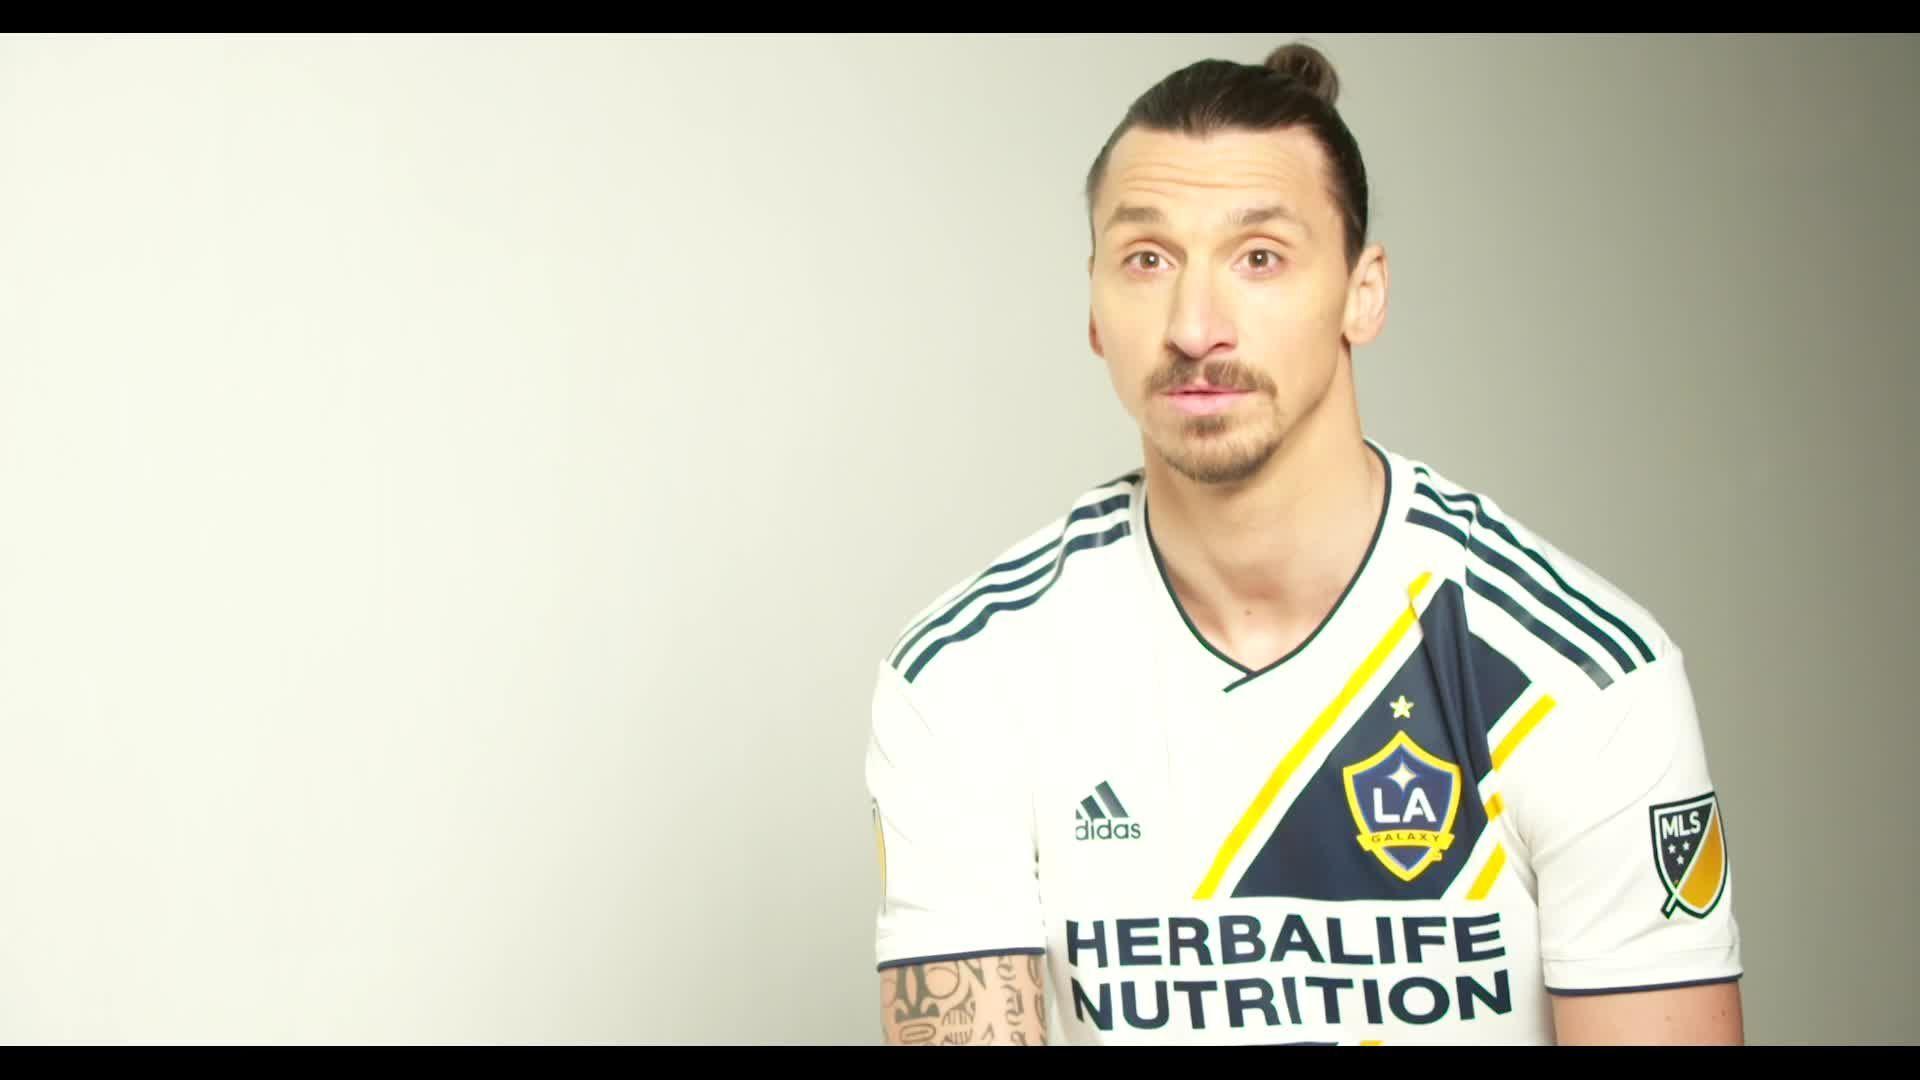 034a69c6d90 Zlatan Ibrahimovic targets more success with LA Galaxy   Football .